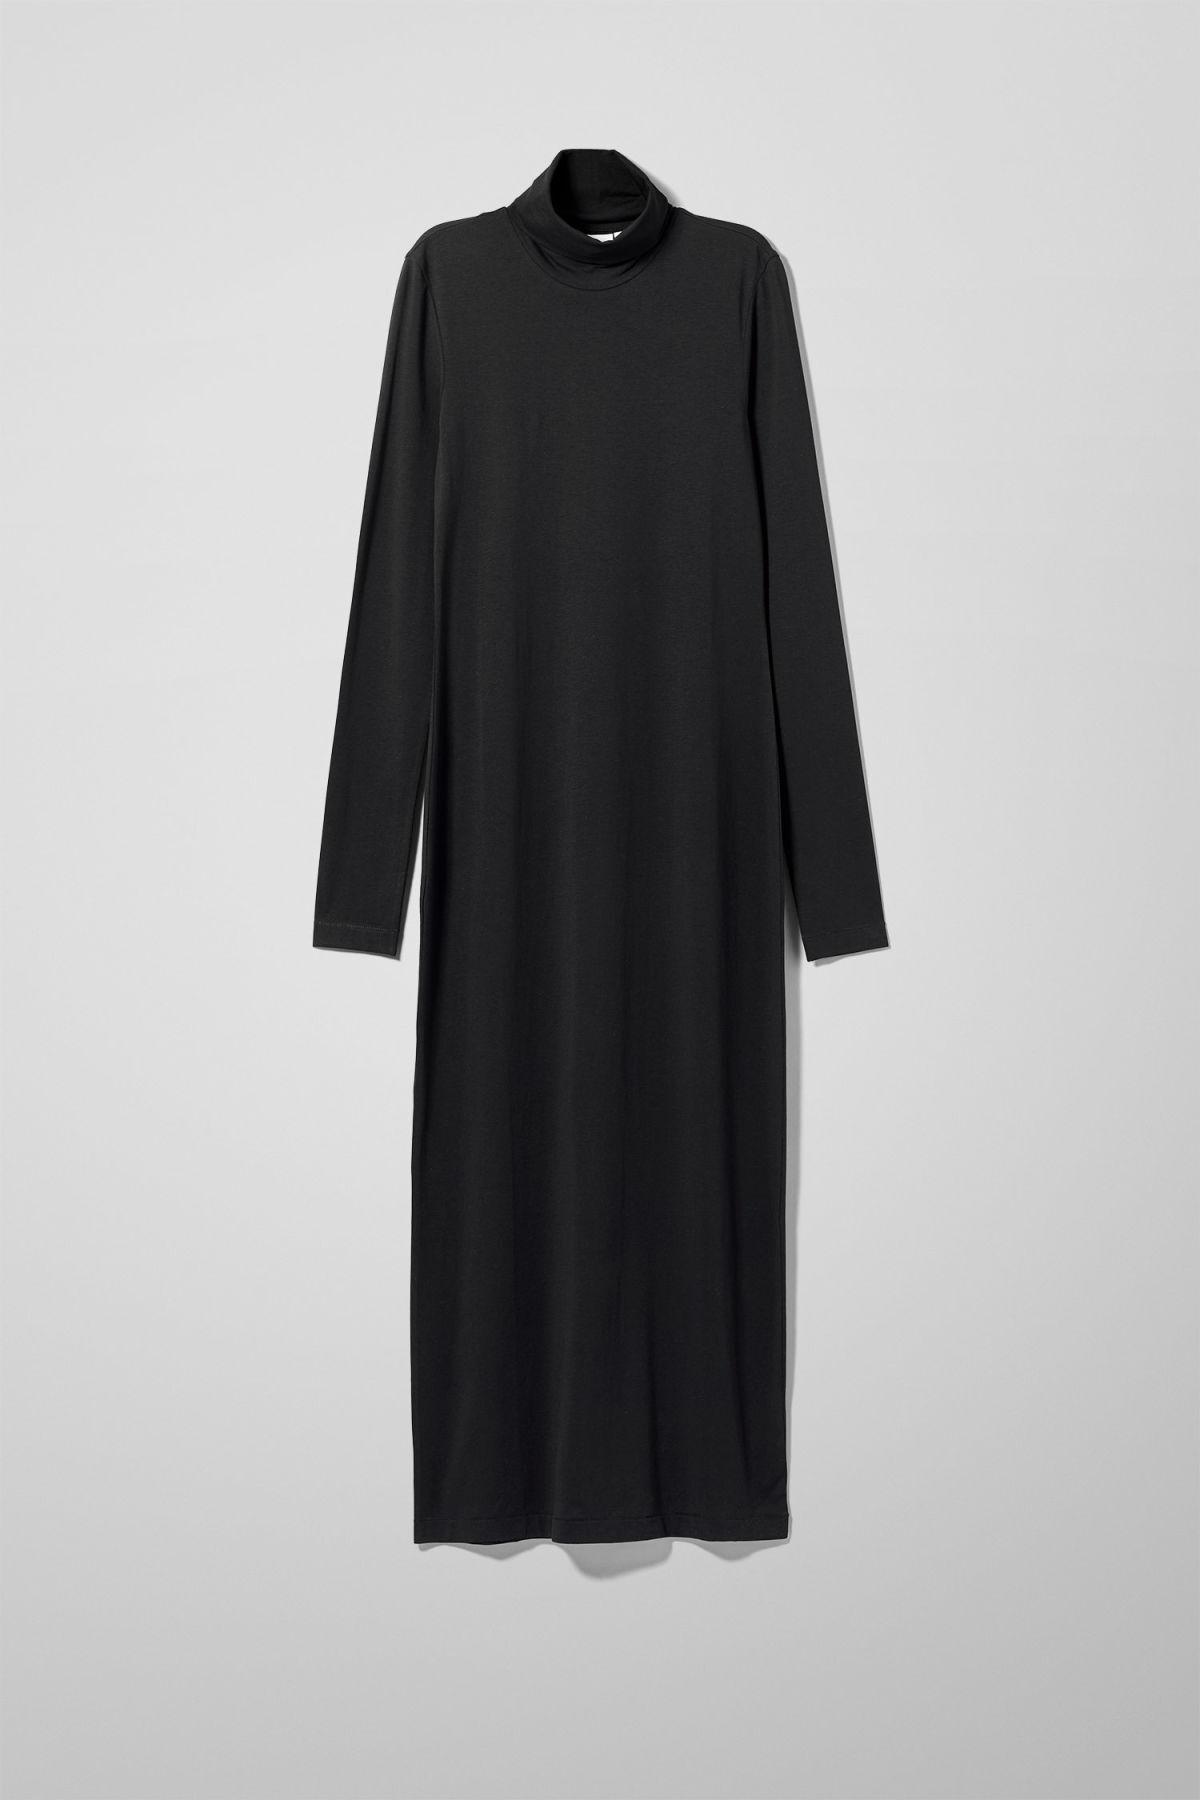 Image of Maxine Dress - Black-XS